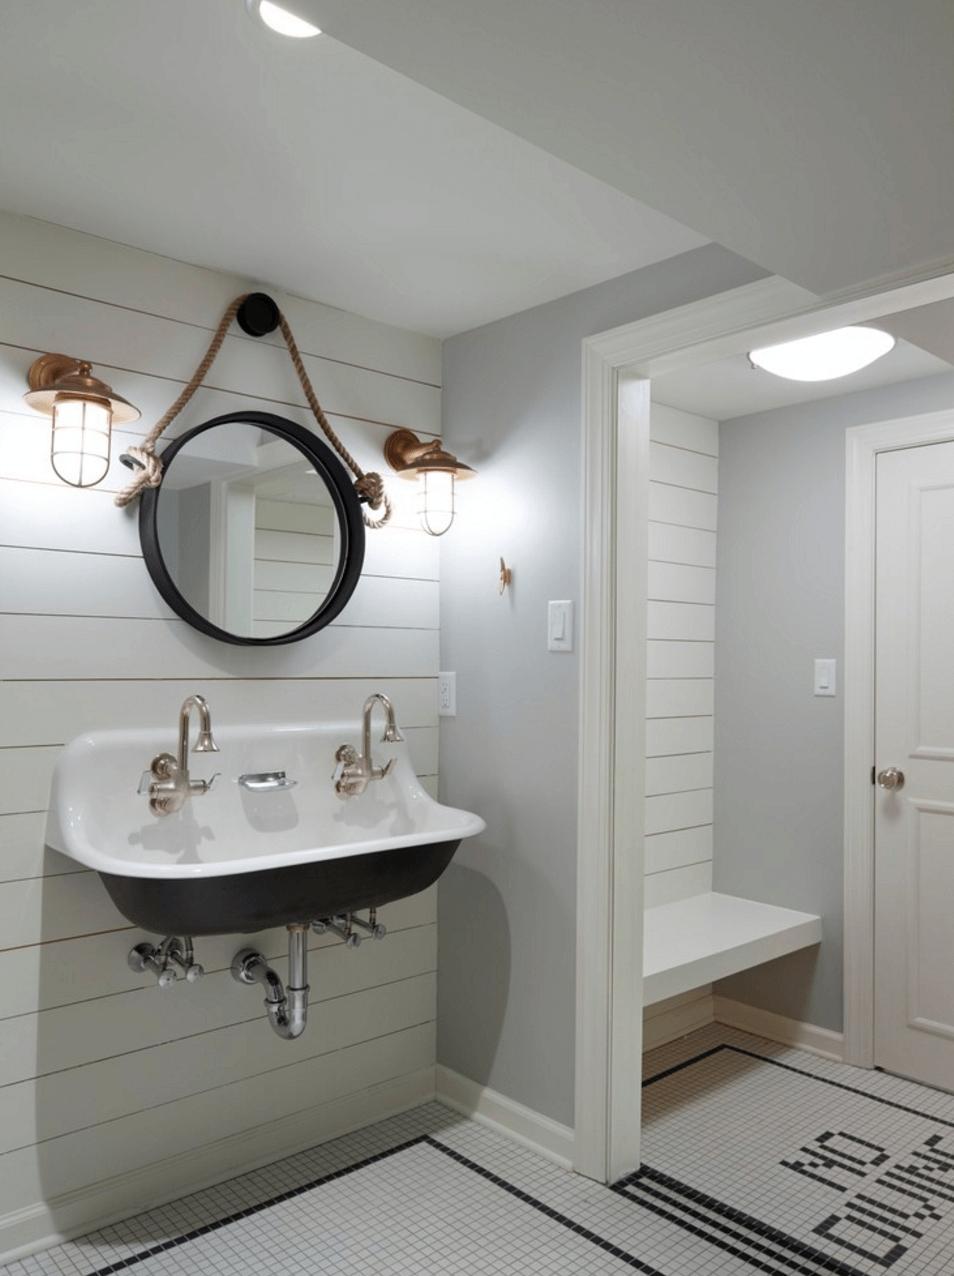 Bathrooms Design : Bathroom Wall Mirrors Black Bathroom Mirror For Bathroom Wall Mirrors With Lights (Photo 12 of 20)